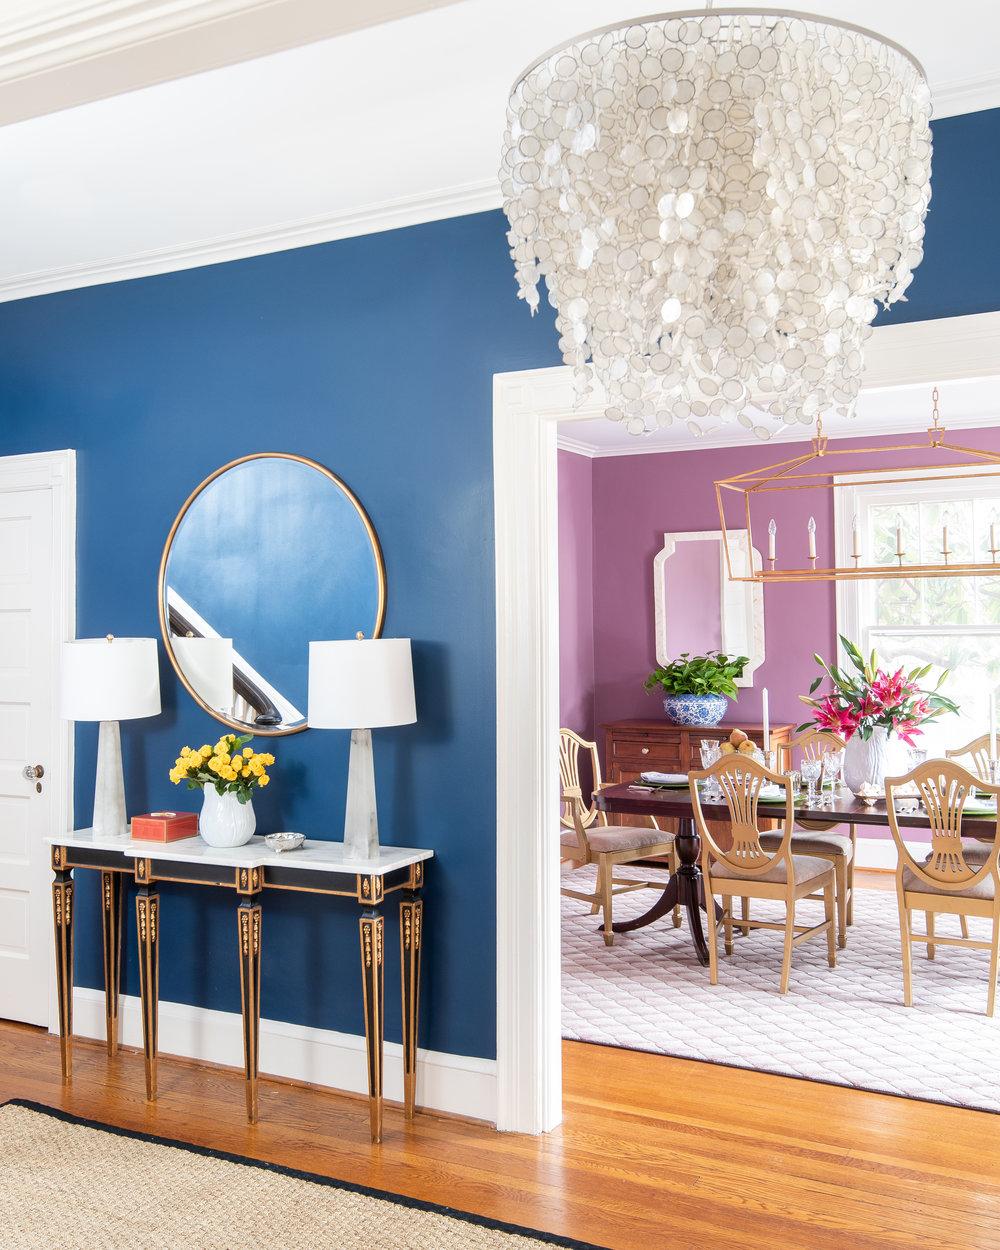 blue-foyer-capiz-chandelier-dc-interior-design-dmv-elegant-home-interiors-mariella-cruzado-decorator-splendor-styling.jpg